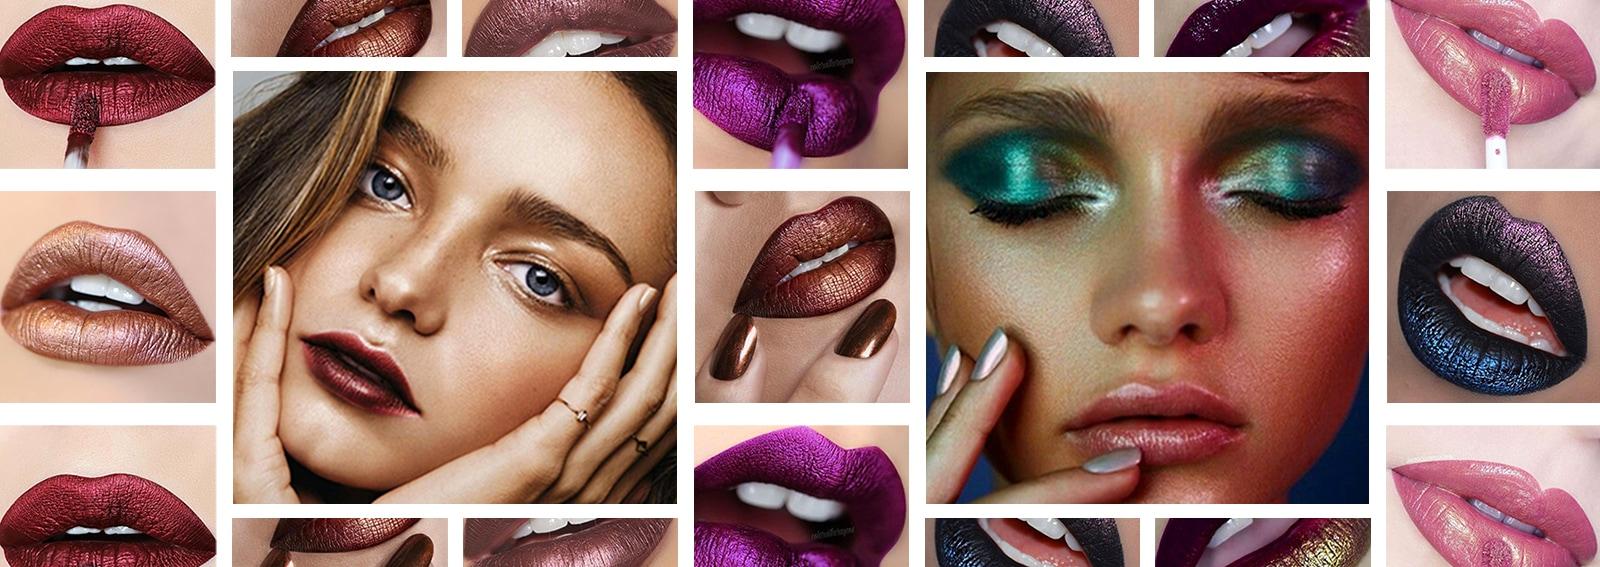 labbra metallizzate collage_desktop